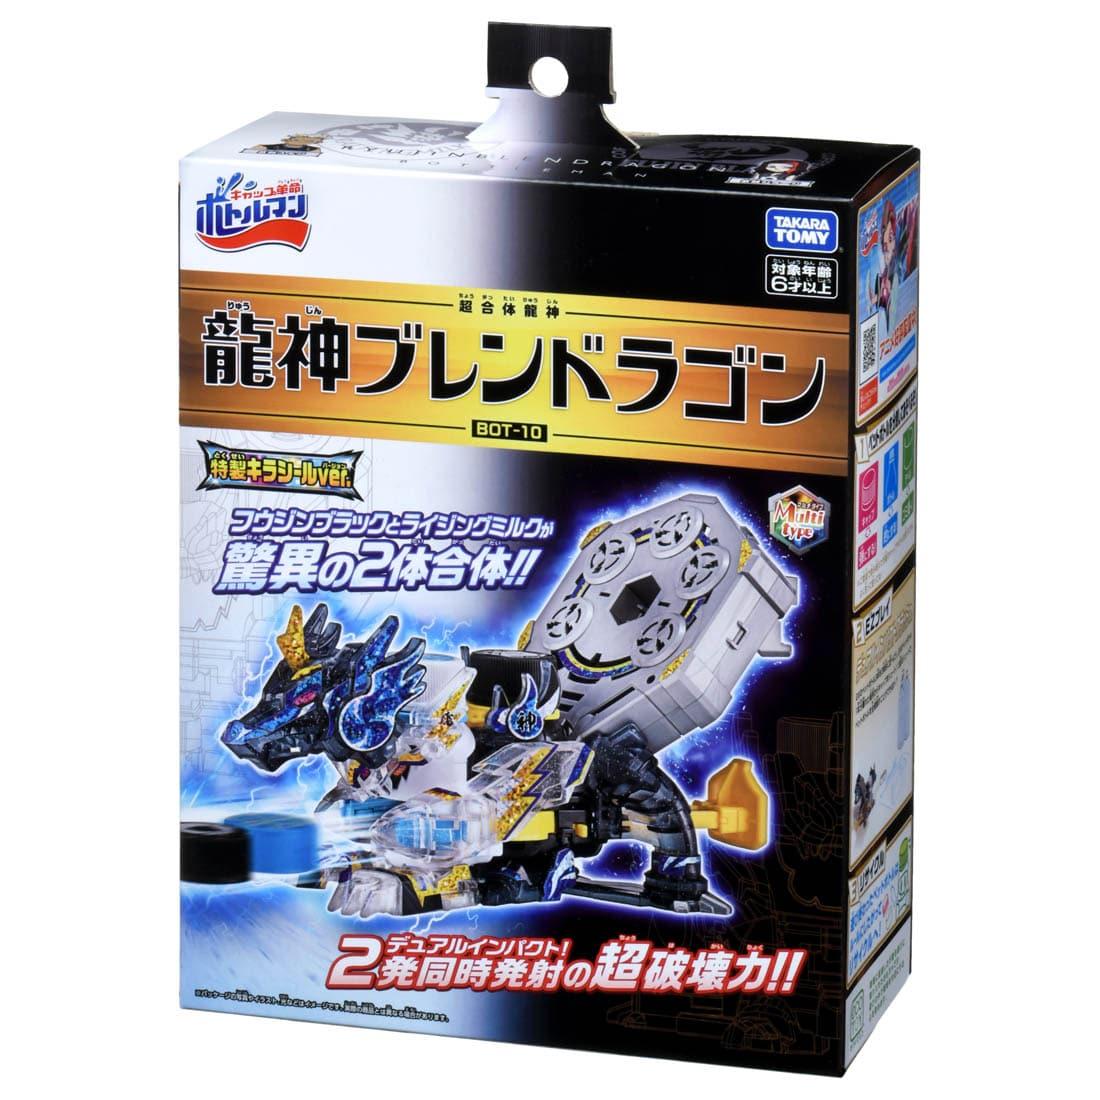 《TAKARA TOMY》 激鬥瓶蓋人 BOT-10 龍神 特調龍 東喬精品百貨